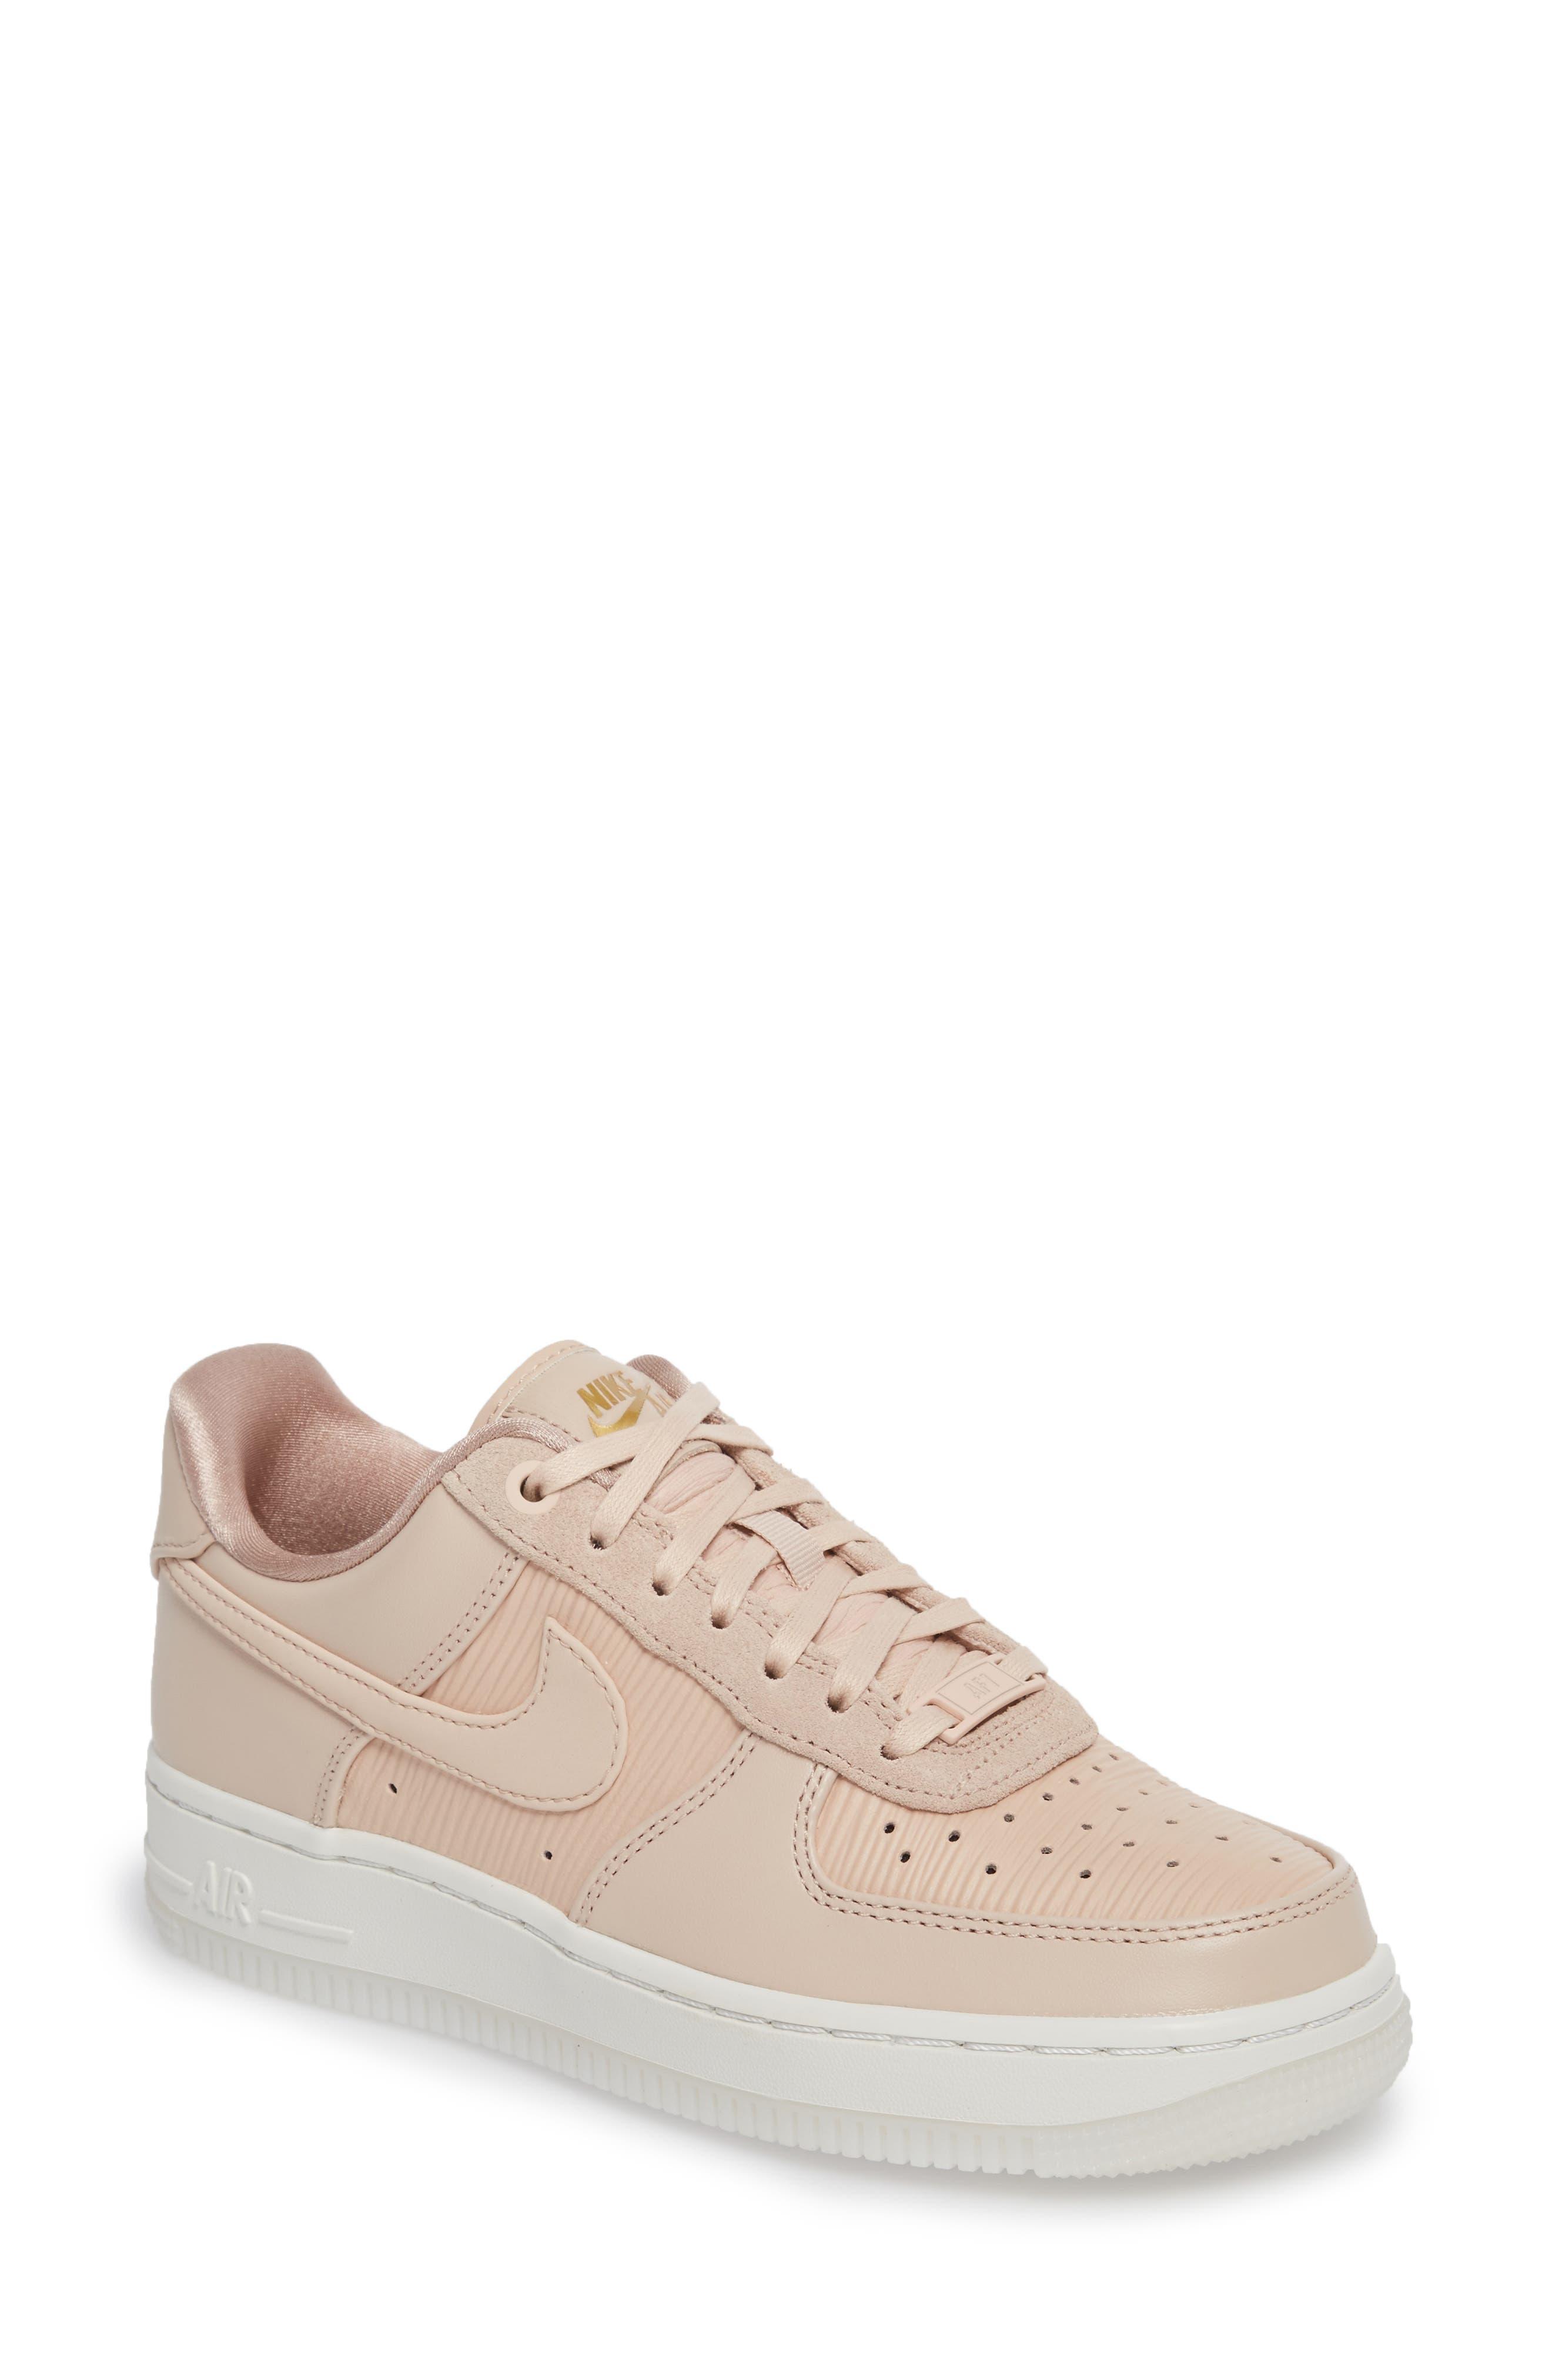 Beige Sneakers Nike for Women Nordstrom